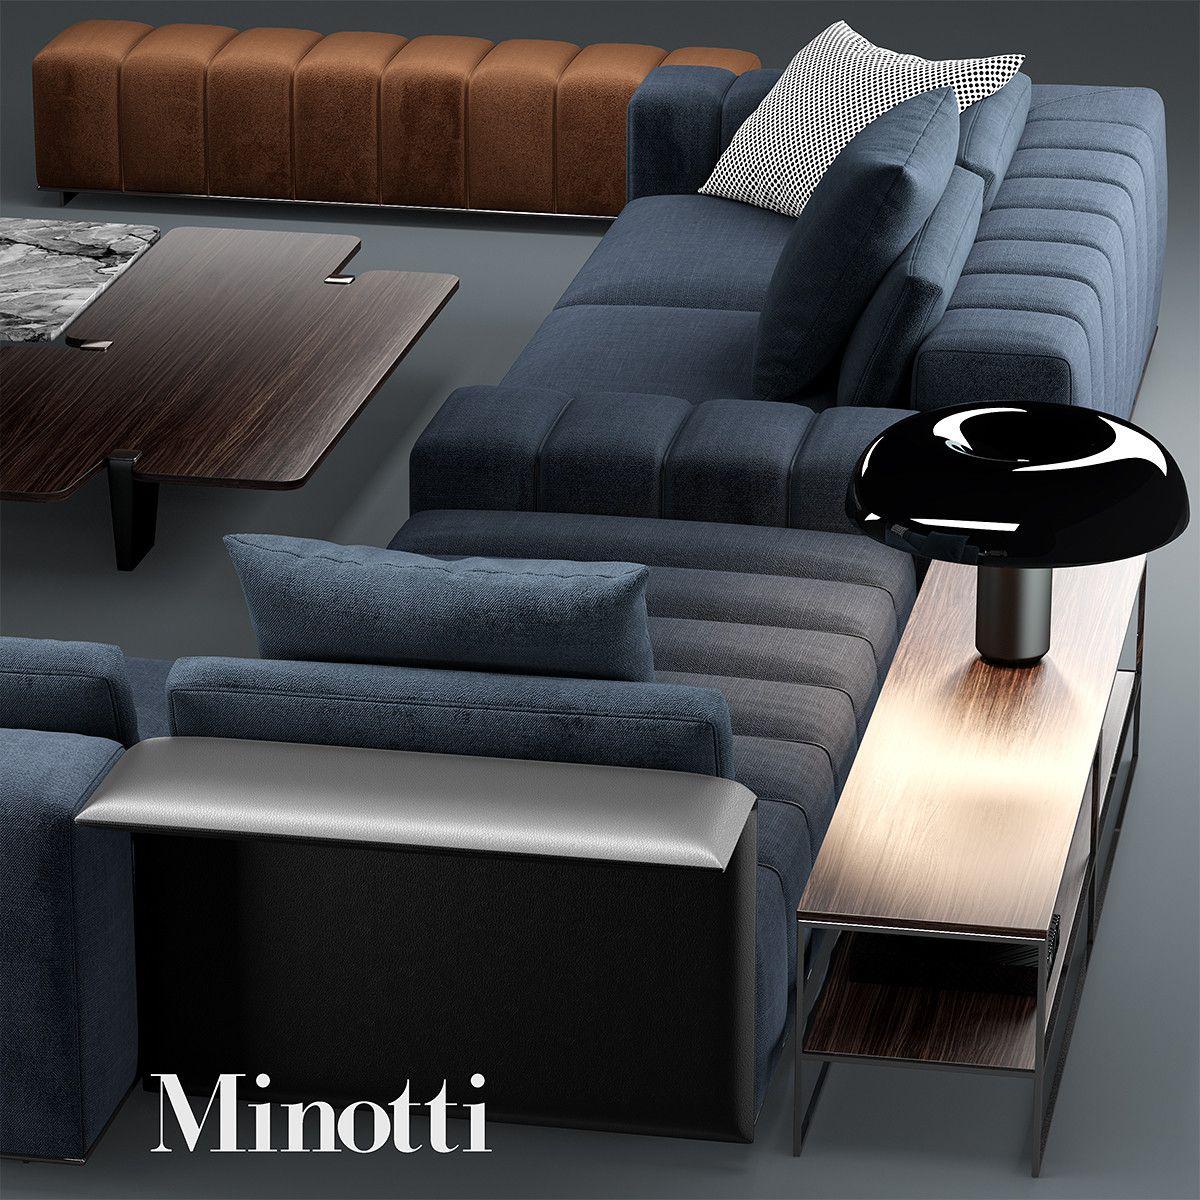 3d sofa minotti freeman model 777 pinterest desk for Divan furniture models